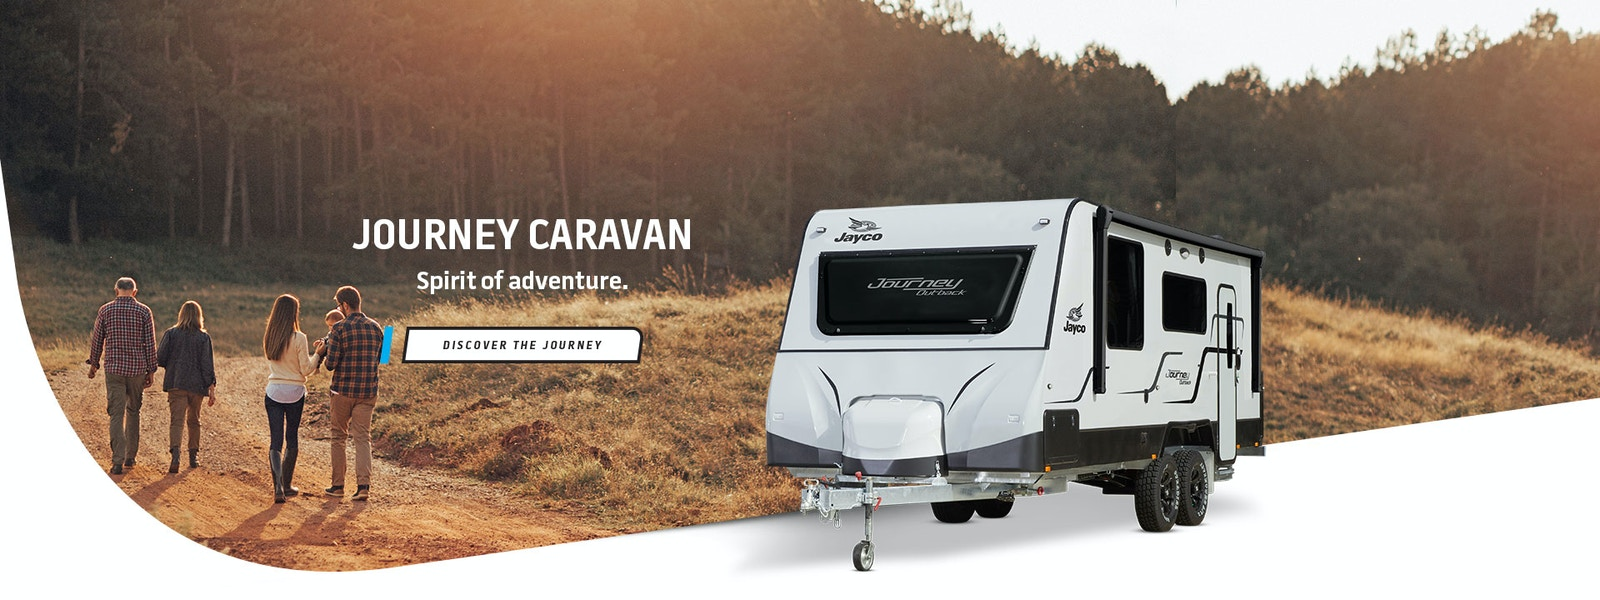 Jayco Journey Caravan